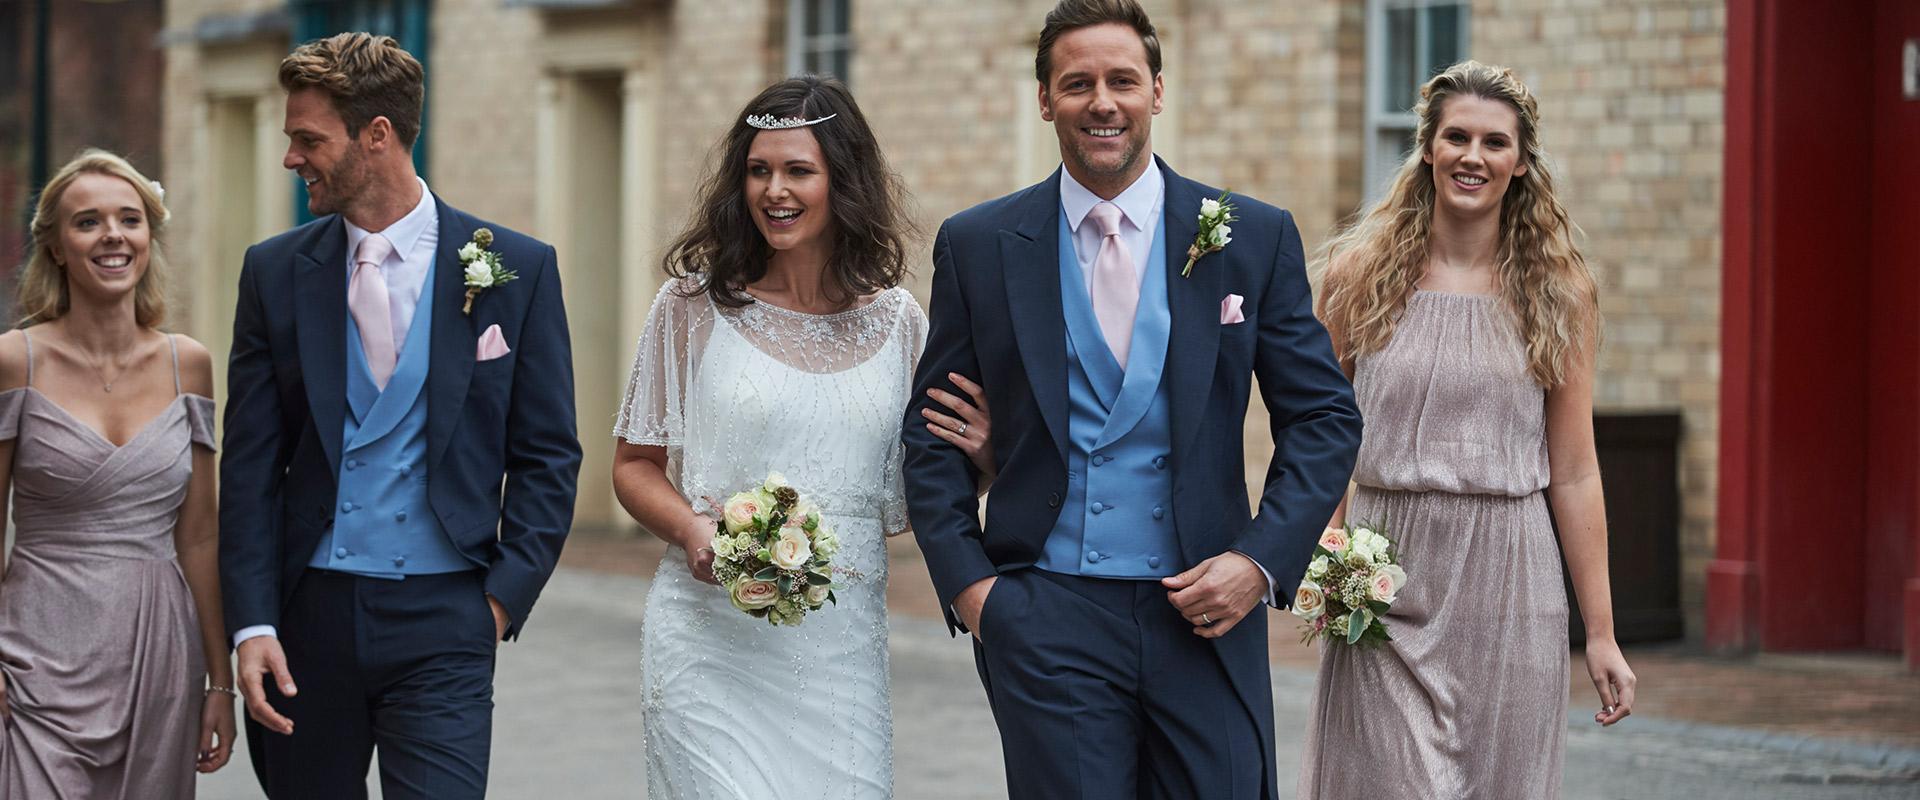 Tailcoat Wedding Suit Hire